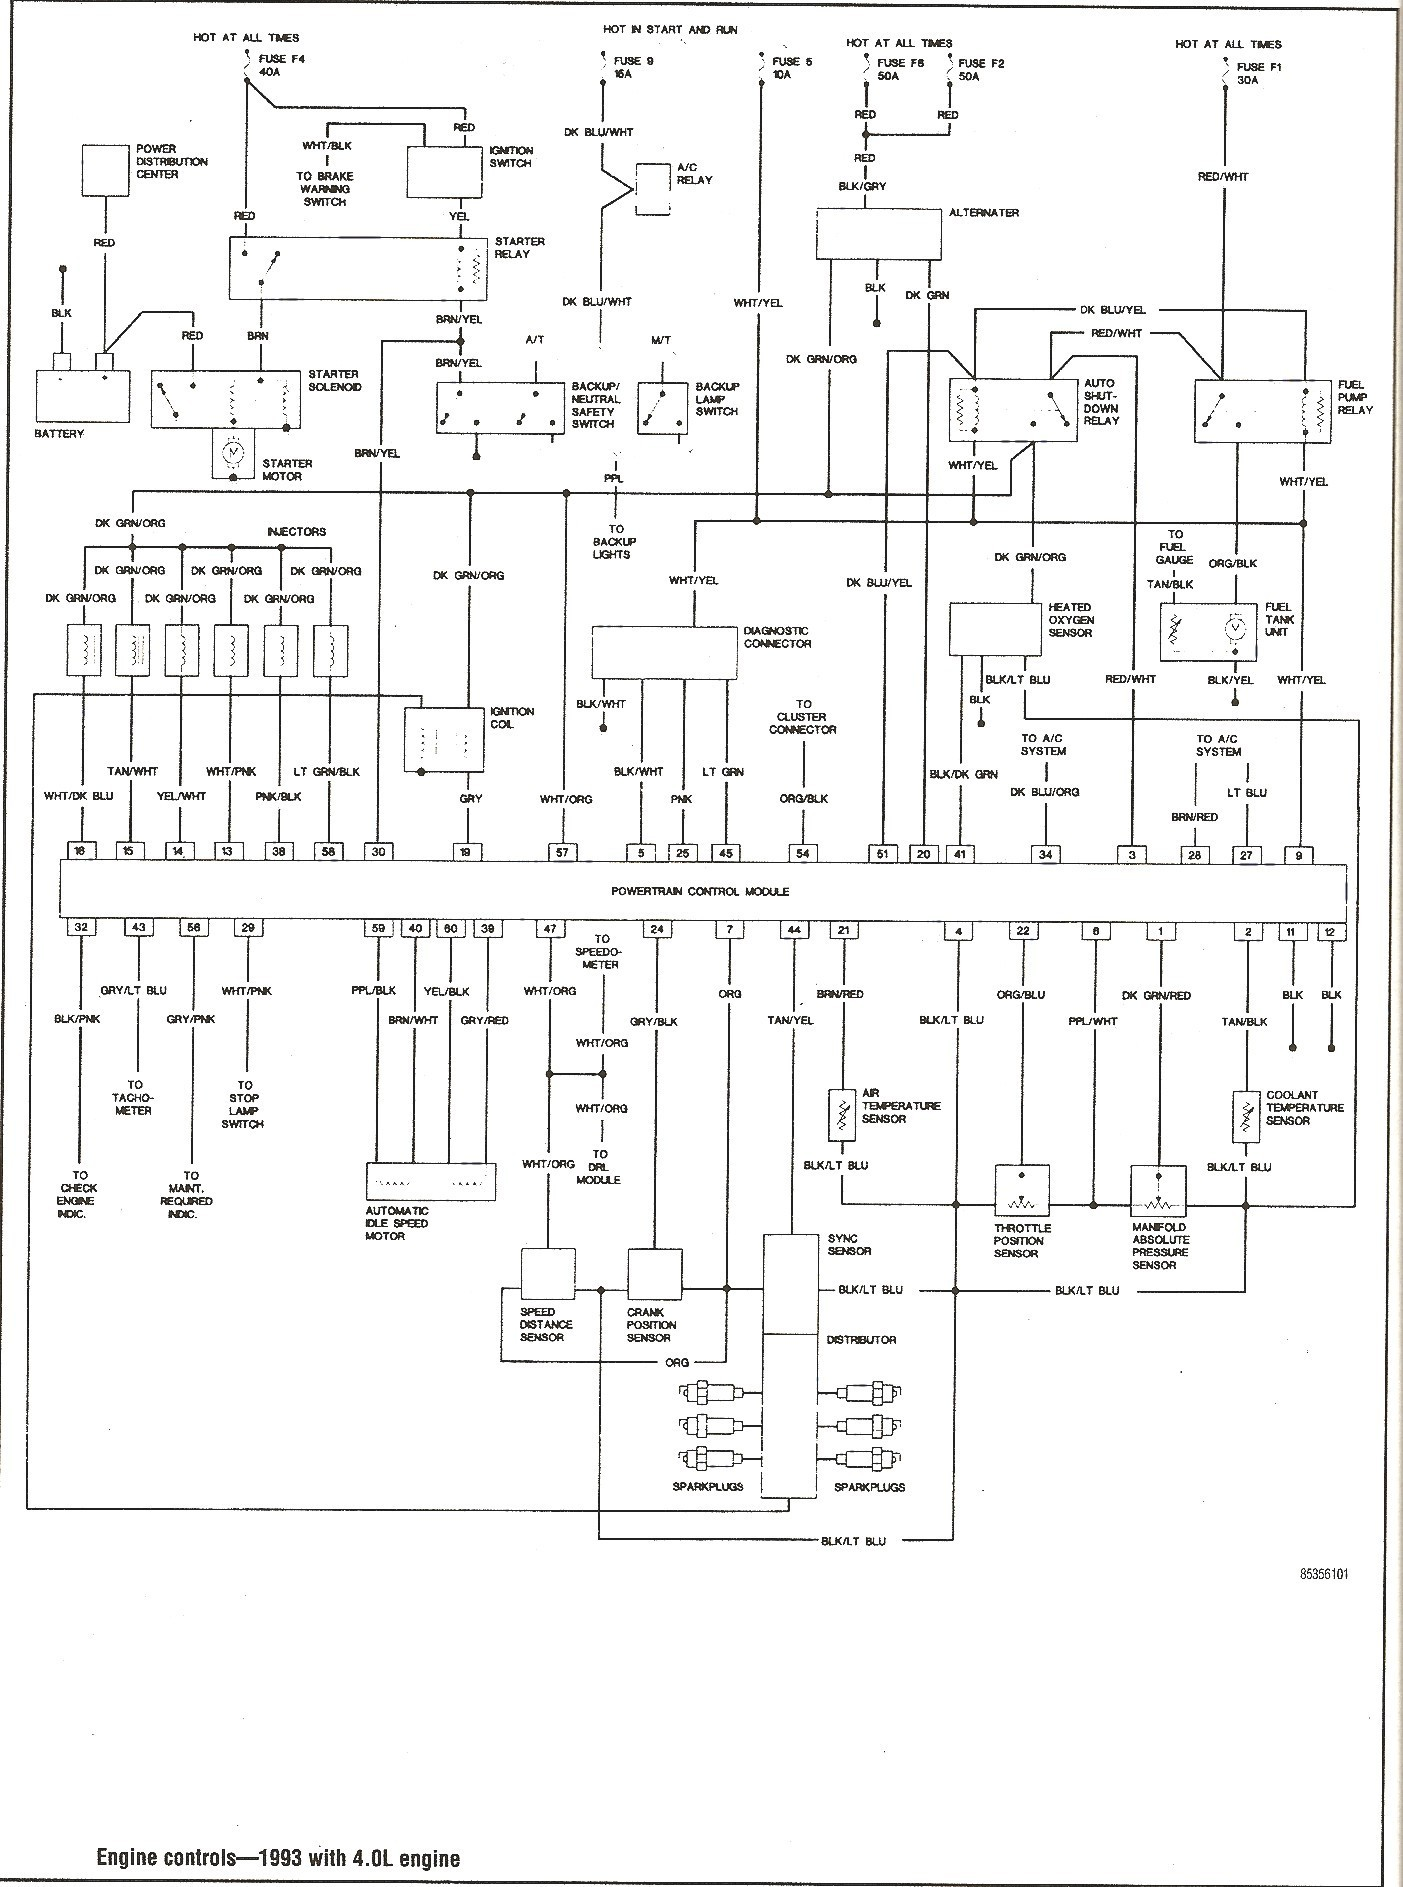 [SCHEMATICS_48YU]  1992 Jeep Wrangler Ignition Switch Wiring - lair.www.seblock.de | Wiring Diagram For 92 Jeep Wrangler |  | Diagram Source